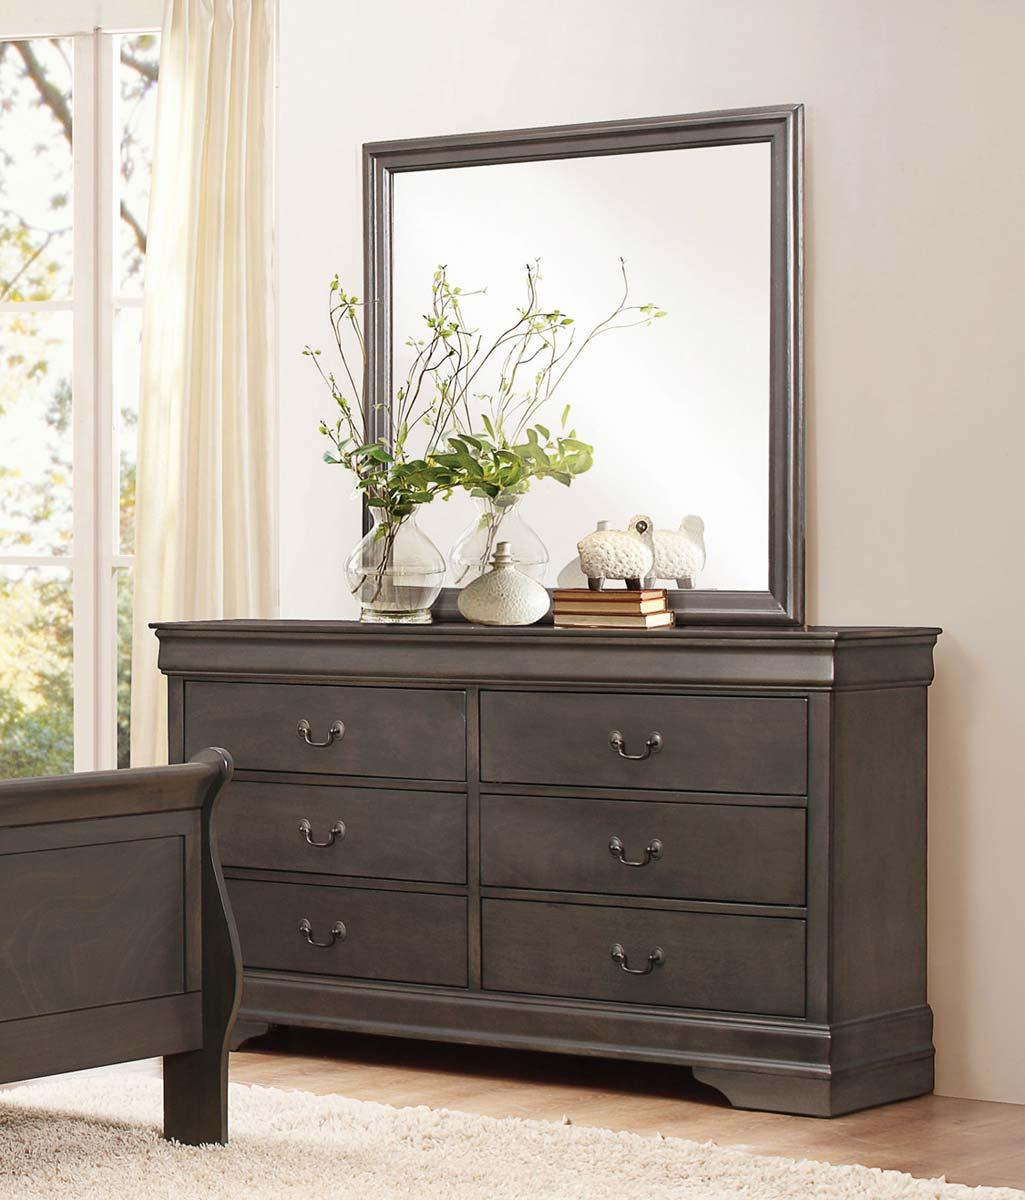 Homelegance Mayville Dresser - Stained Grey